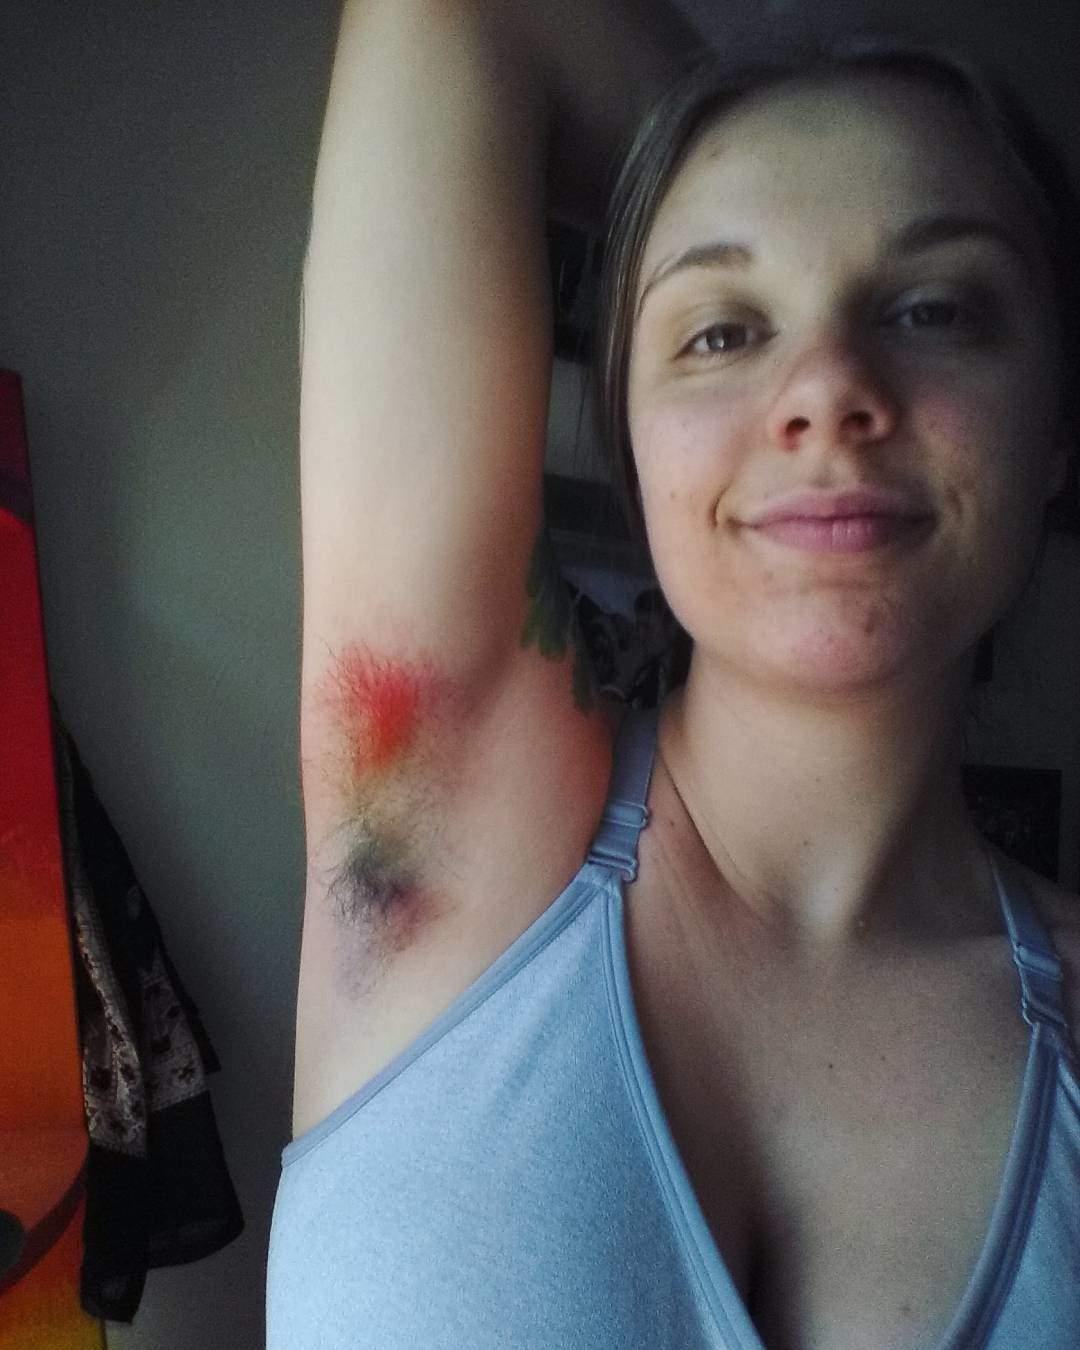 Rainbow armpit